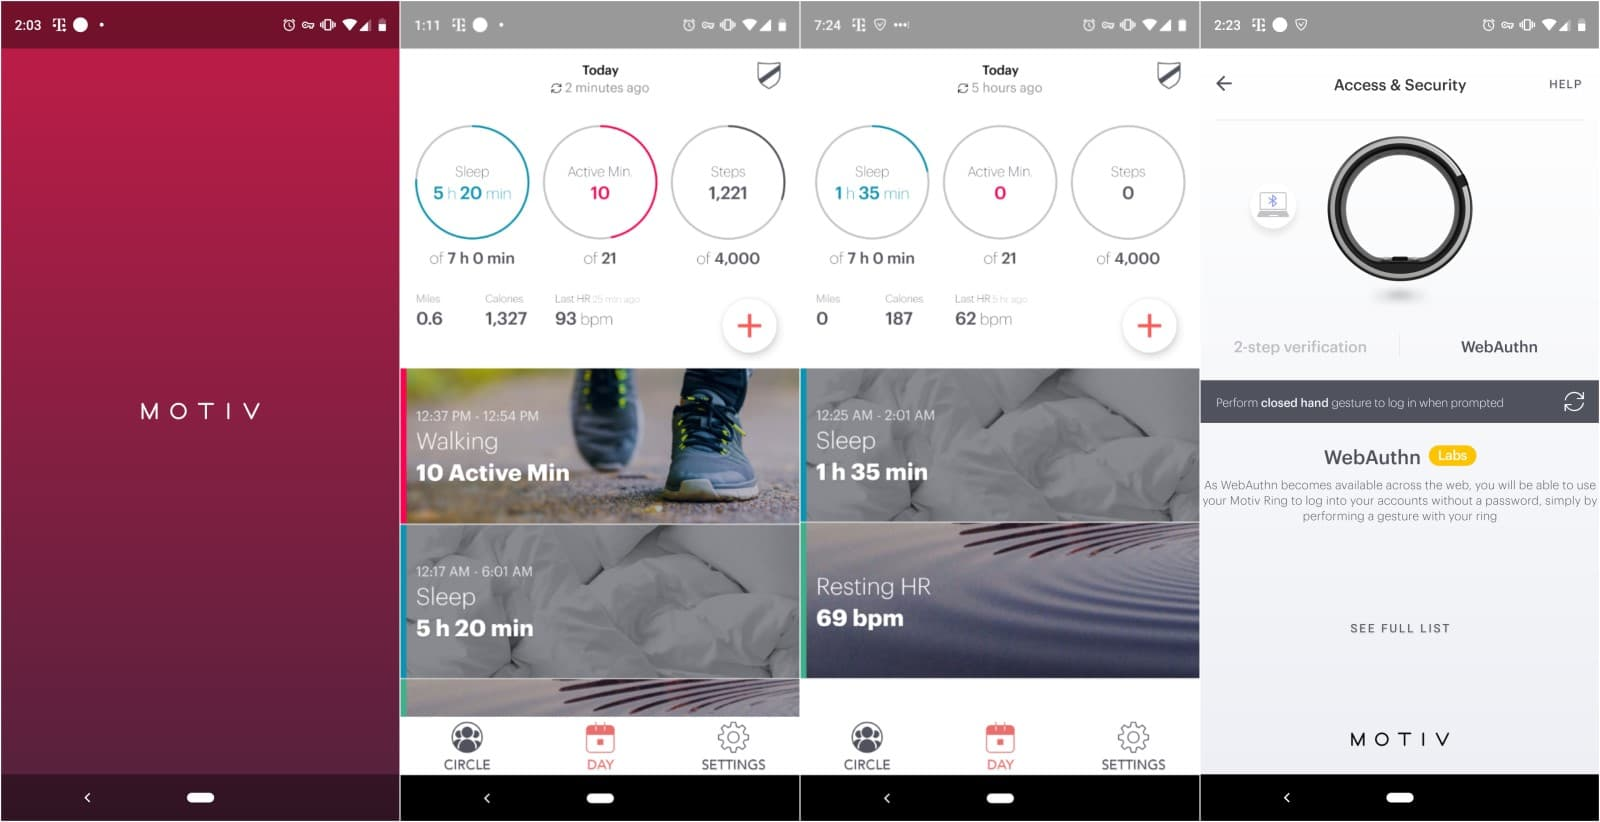 motiv fitness tracking ring app screenshots